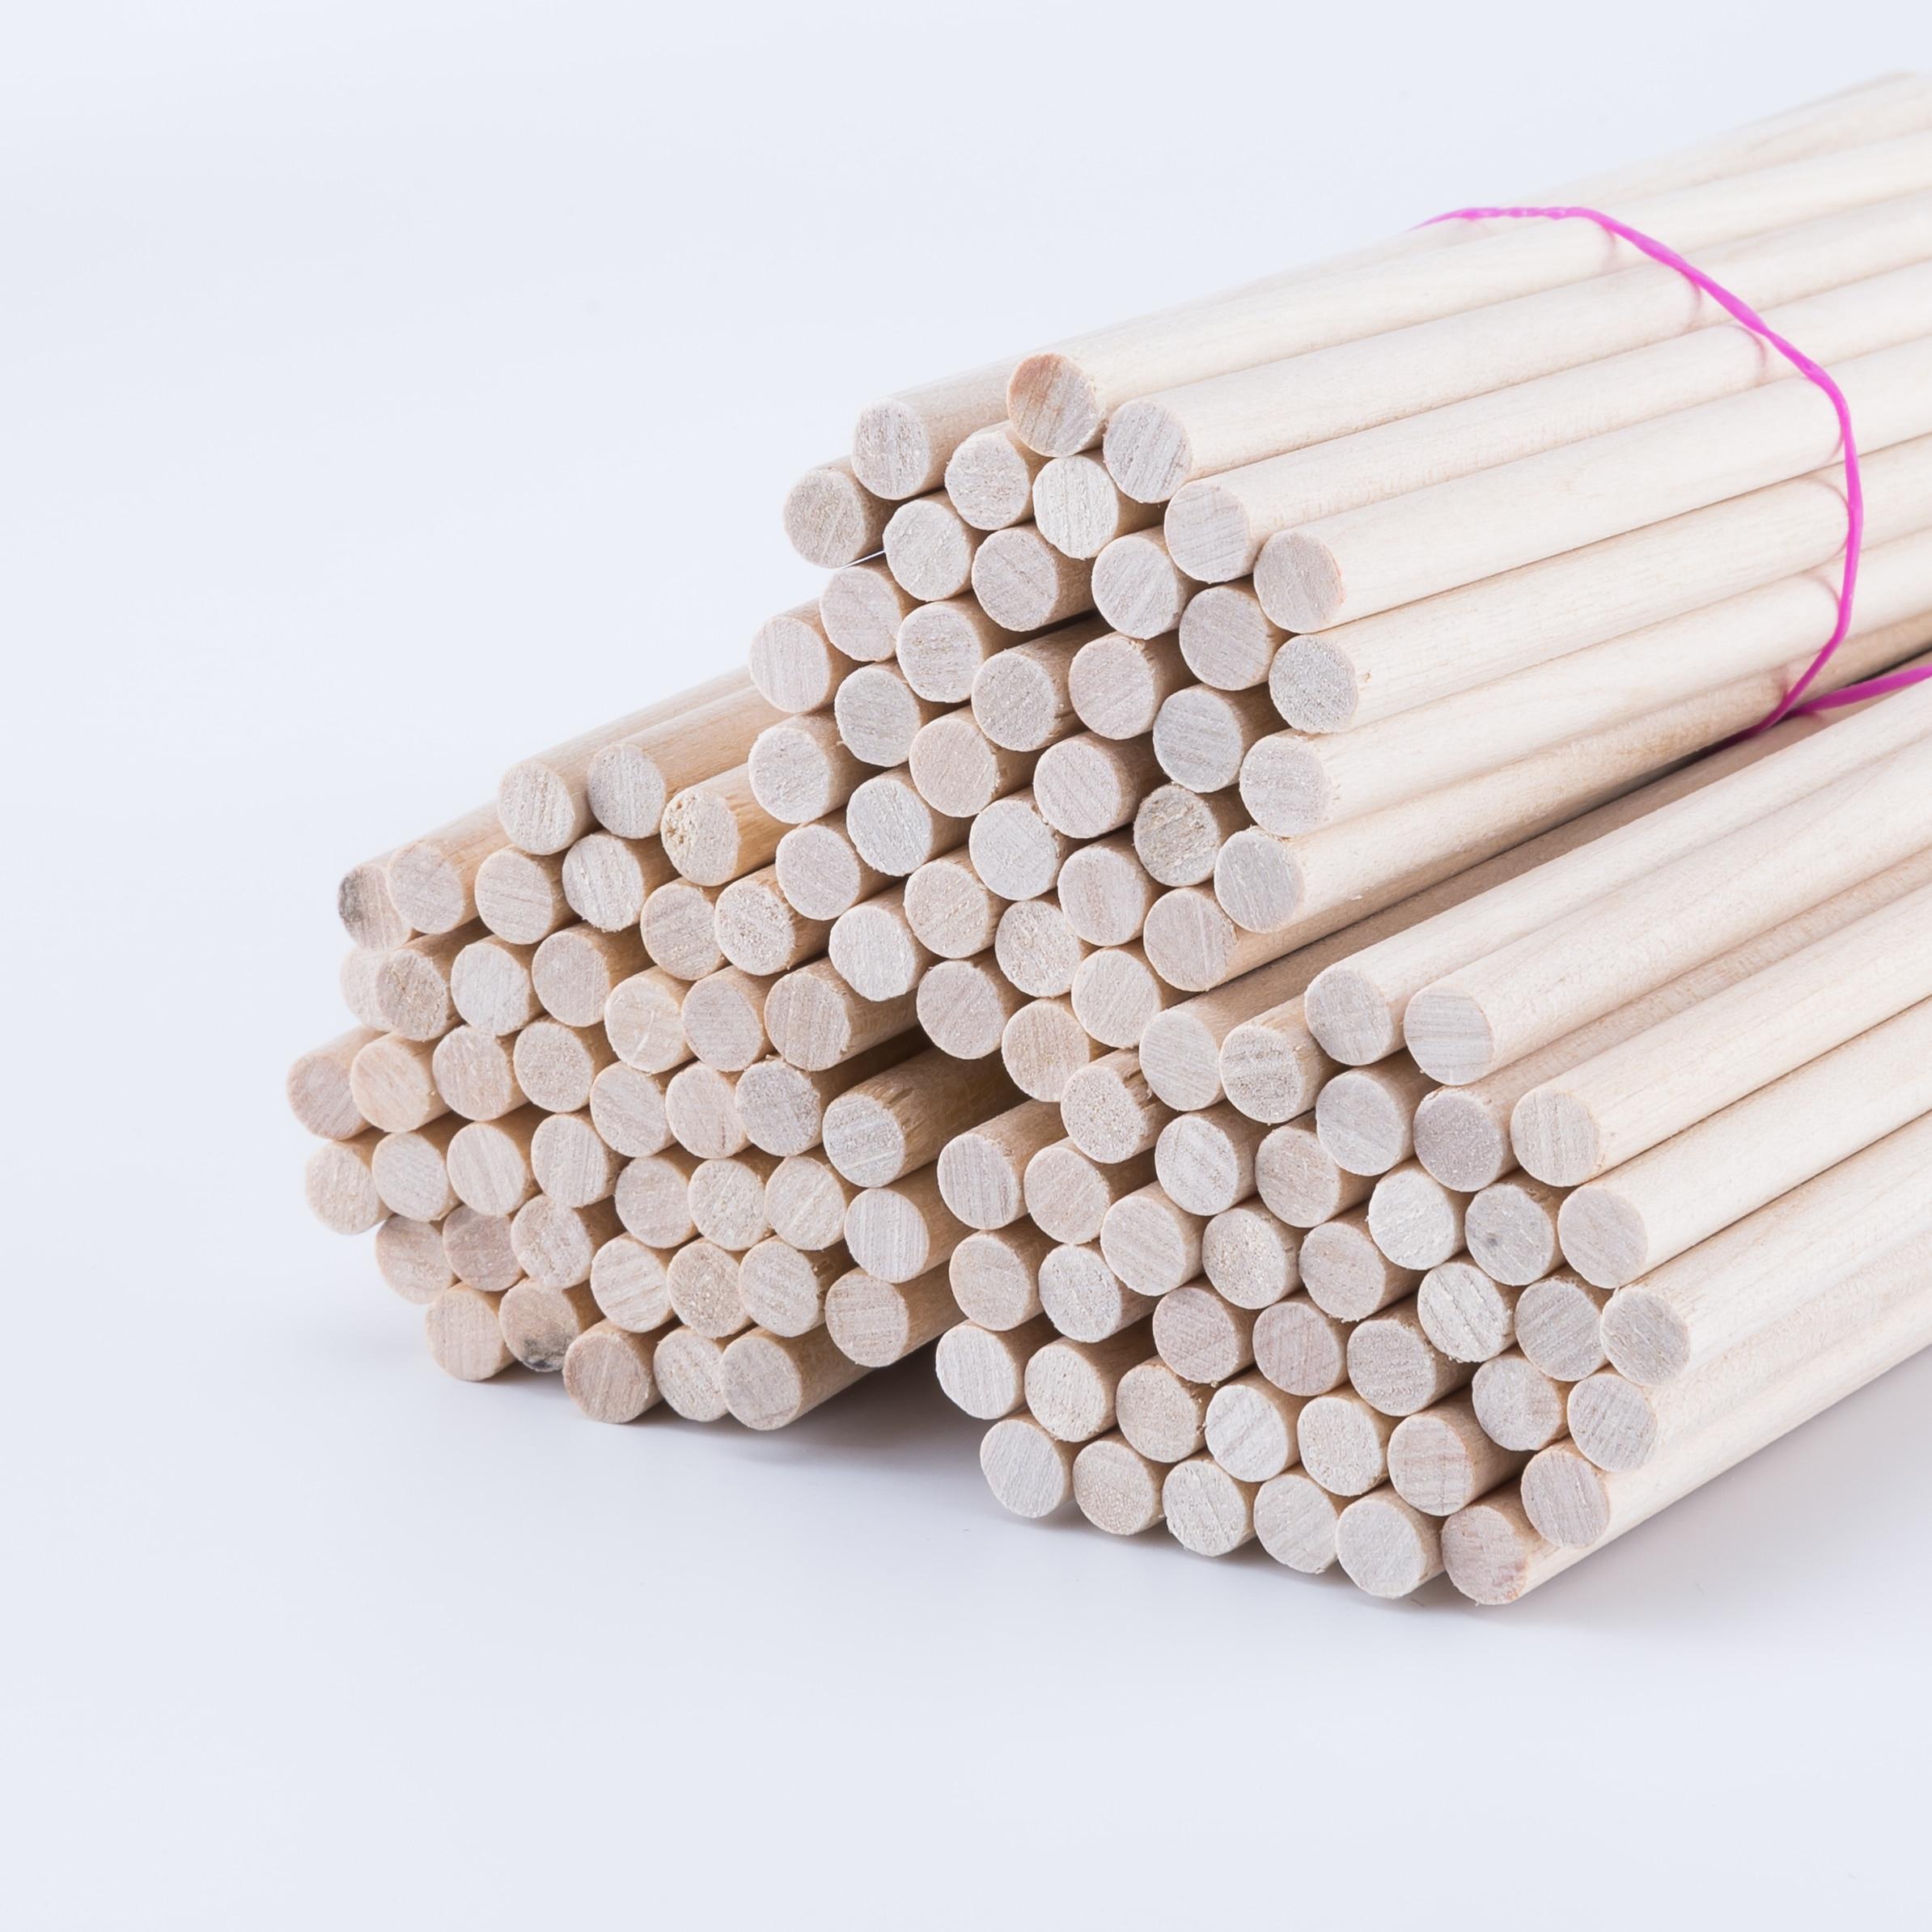 25/50Pcs 0.15cm Maple Round Wooden Rods Sticks Premium Durable Wooden Dowel For DIY Crafts Building Model DIY Food Craft